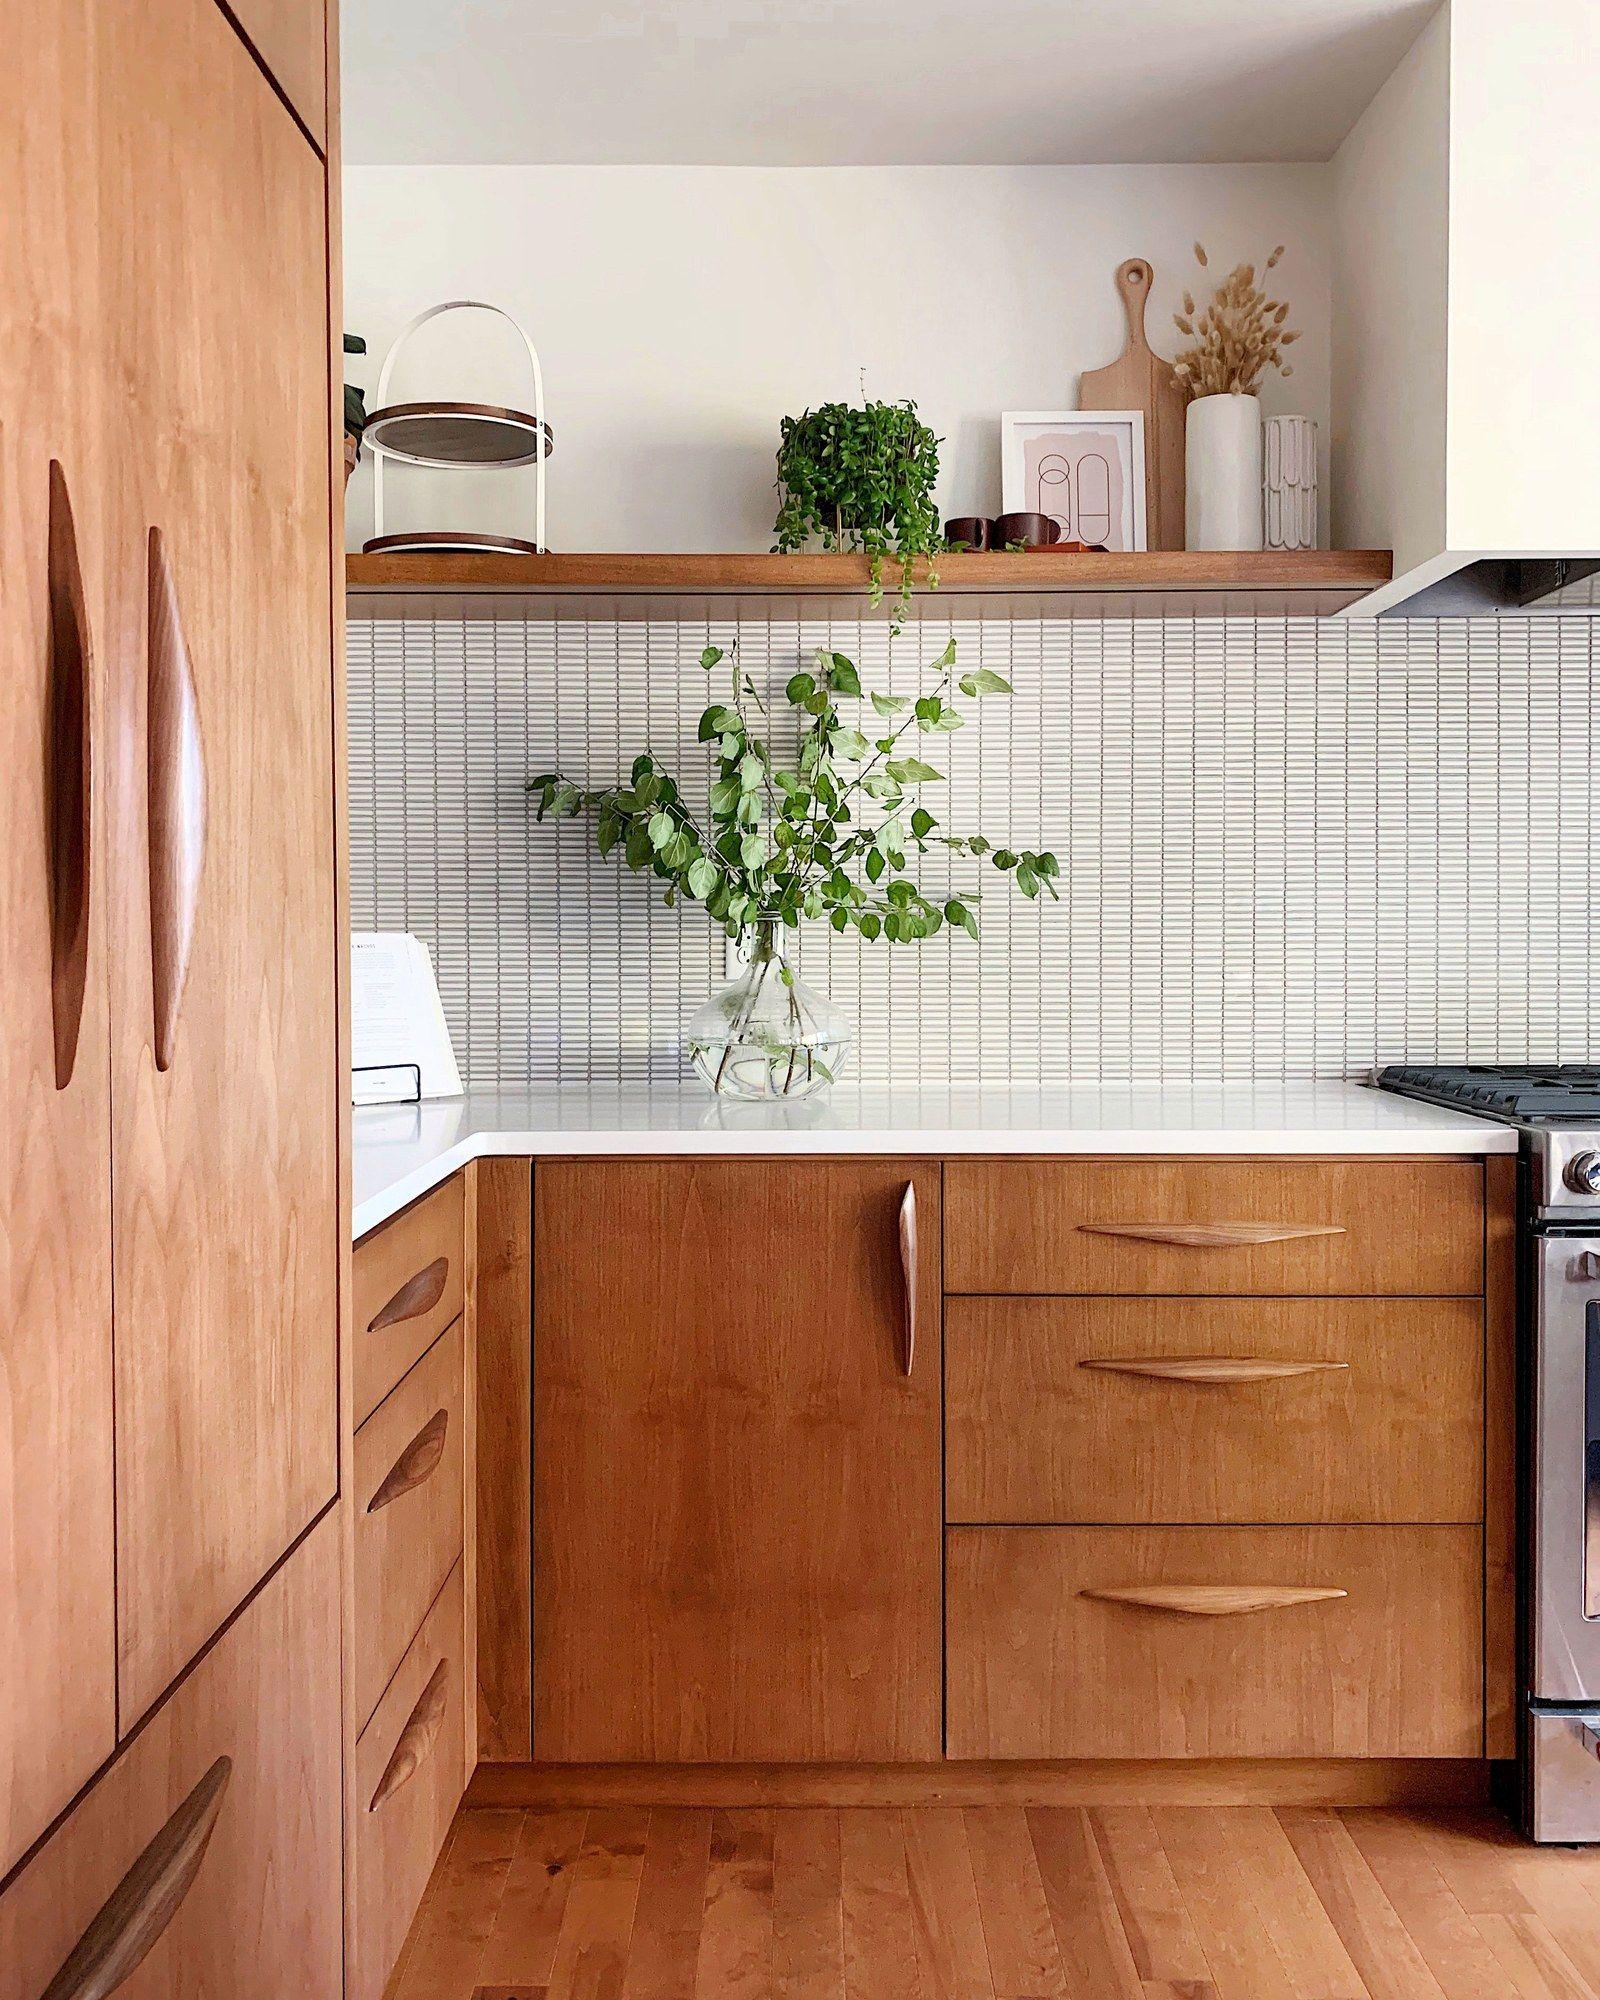 A Lovingly Remodeled Midcentury Modern Kitchen